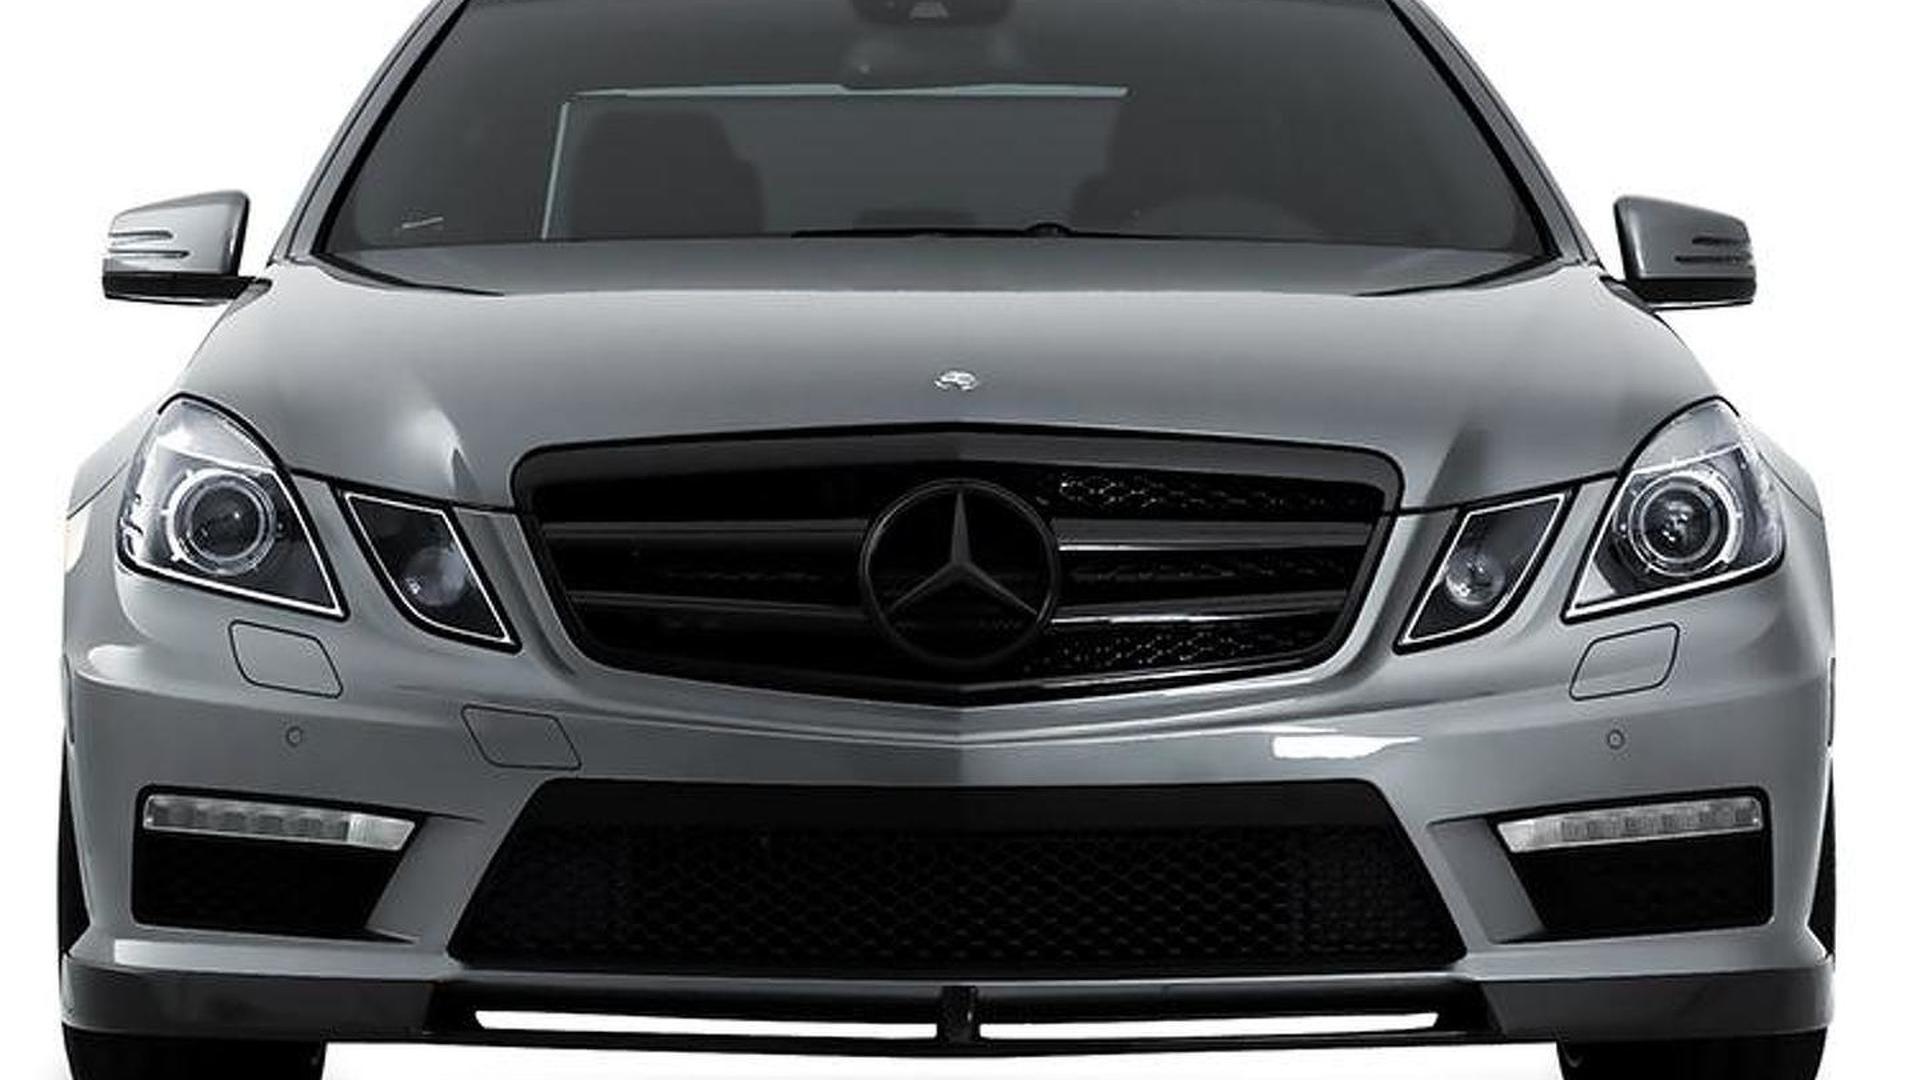 2010 Mercedes Benz E63 AMG with Vorsteiner V6E Aero Package [Video]